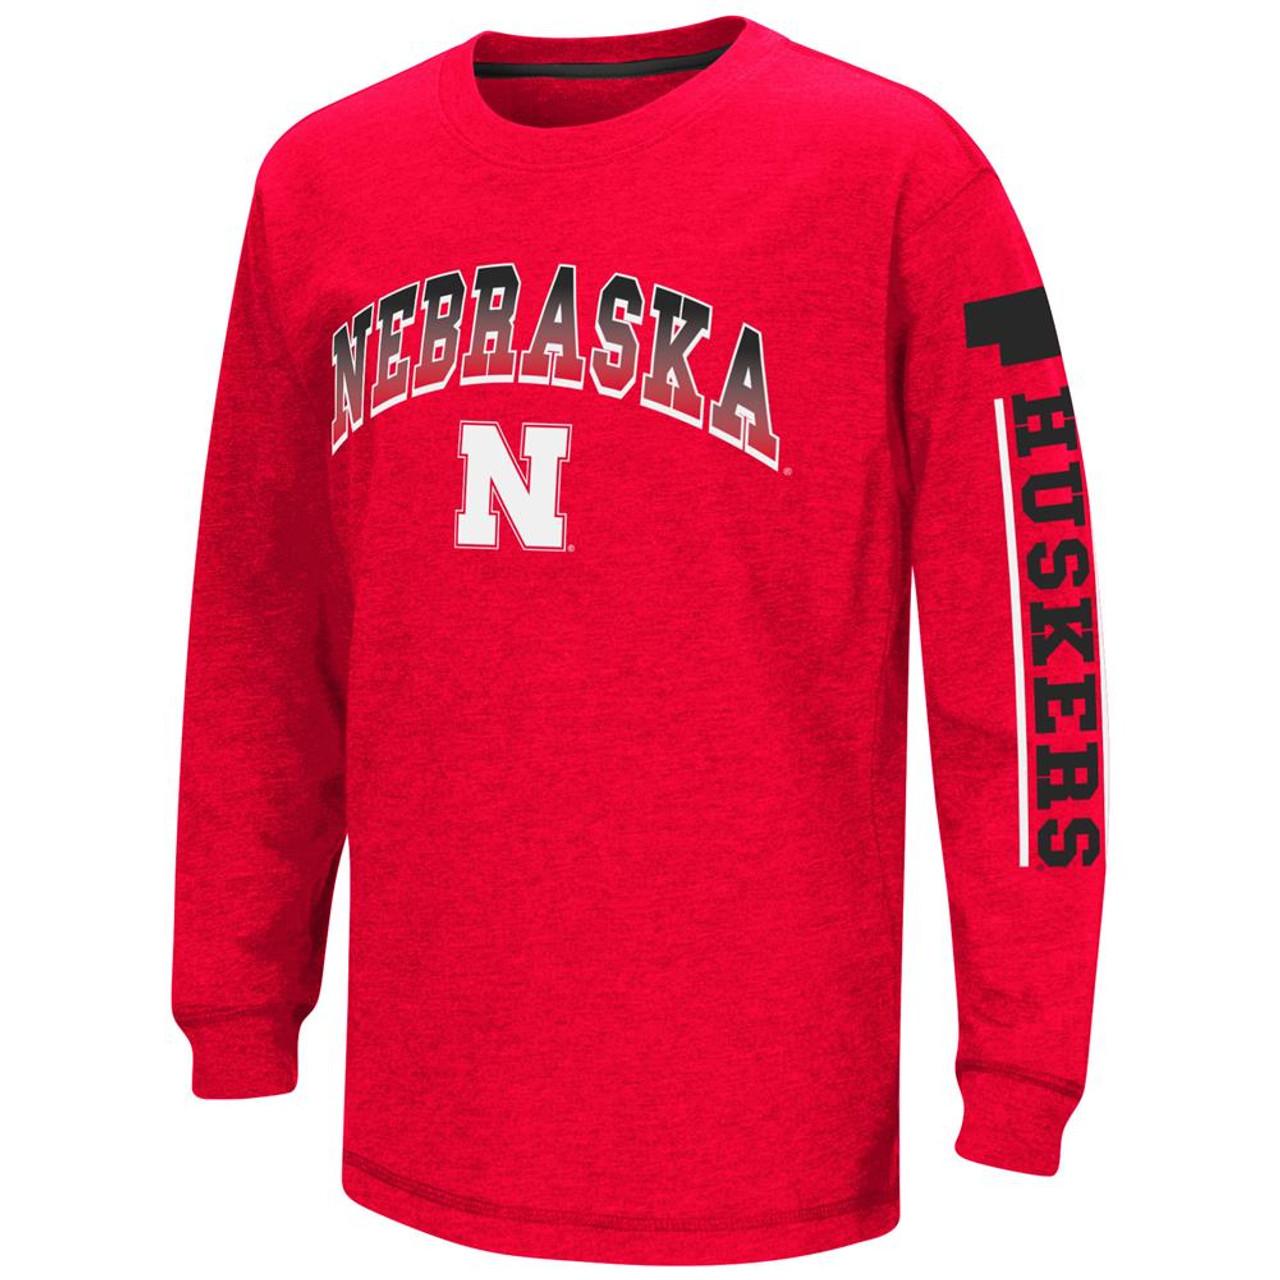 Nebraska Cornhuskers Youth Long Sleeve Shirt